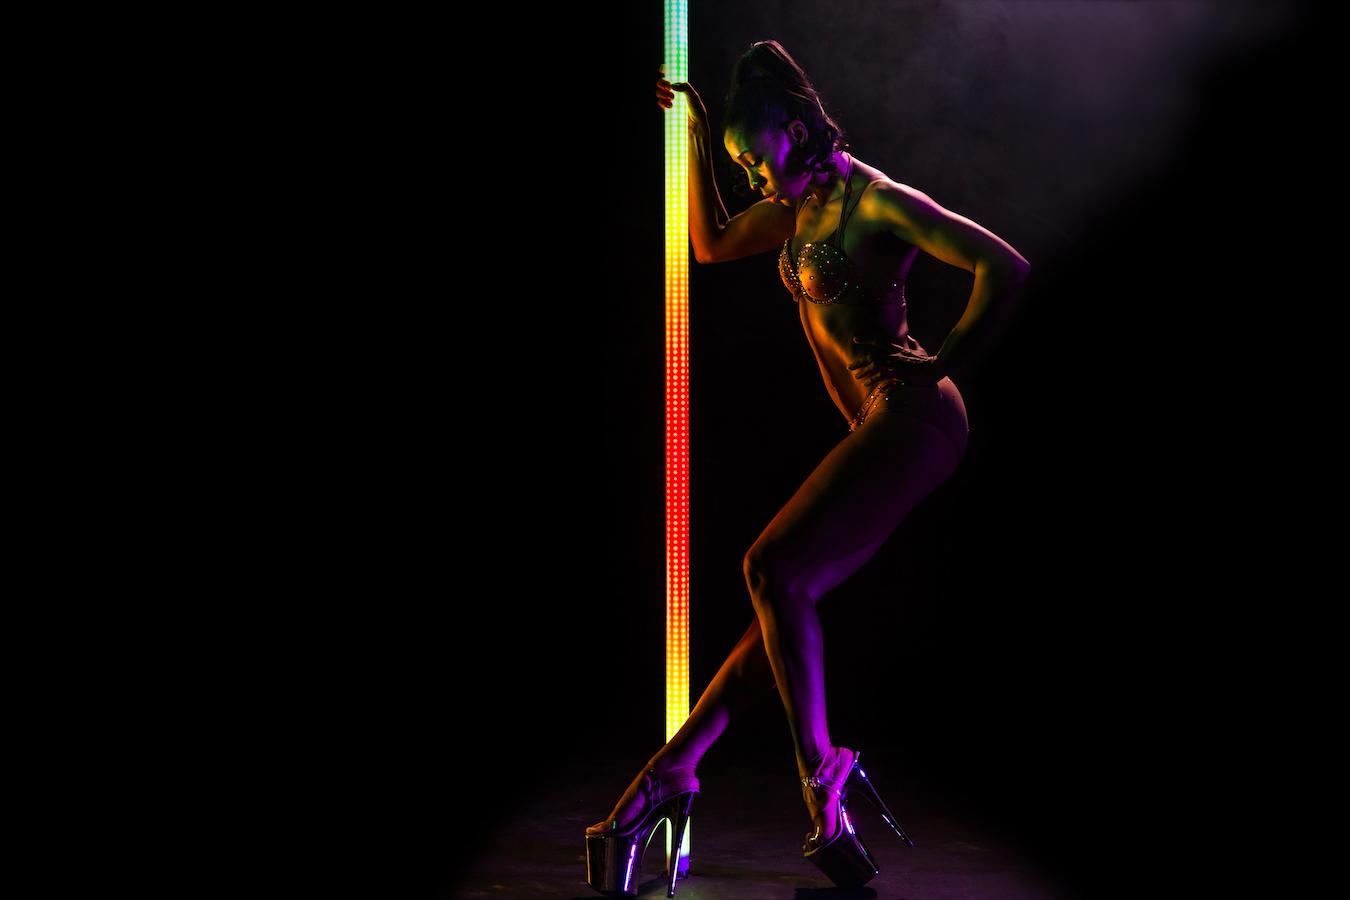 PoleFX LED Dance Pole 20